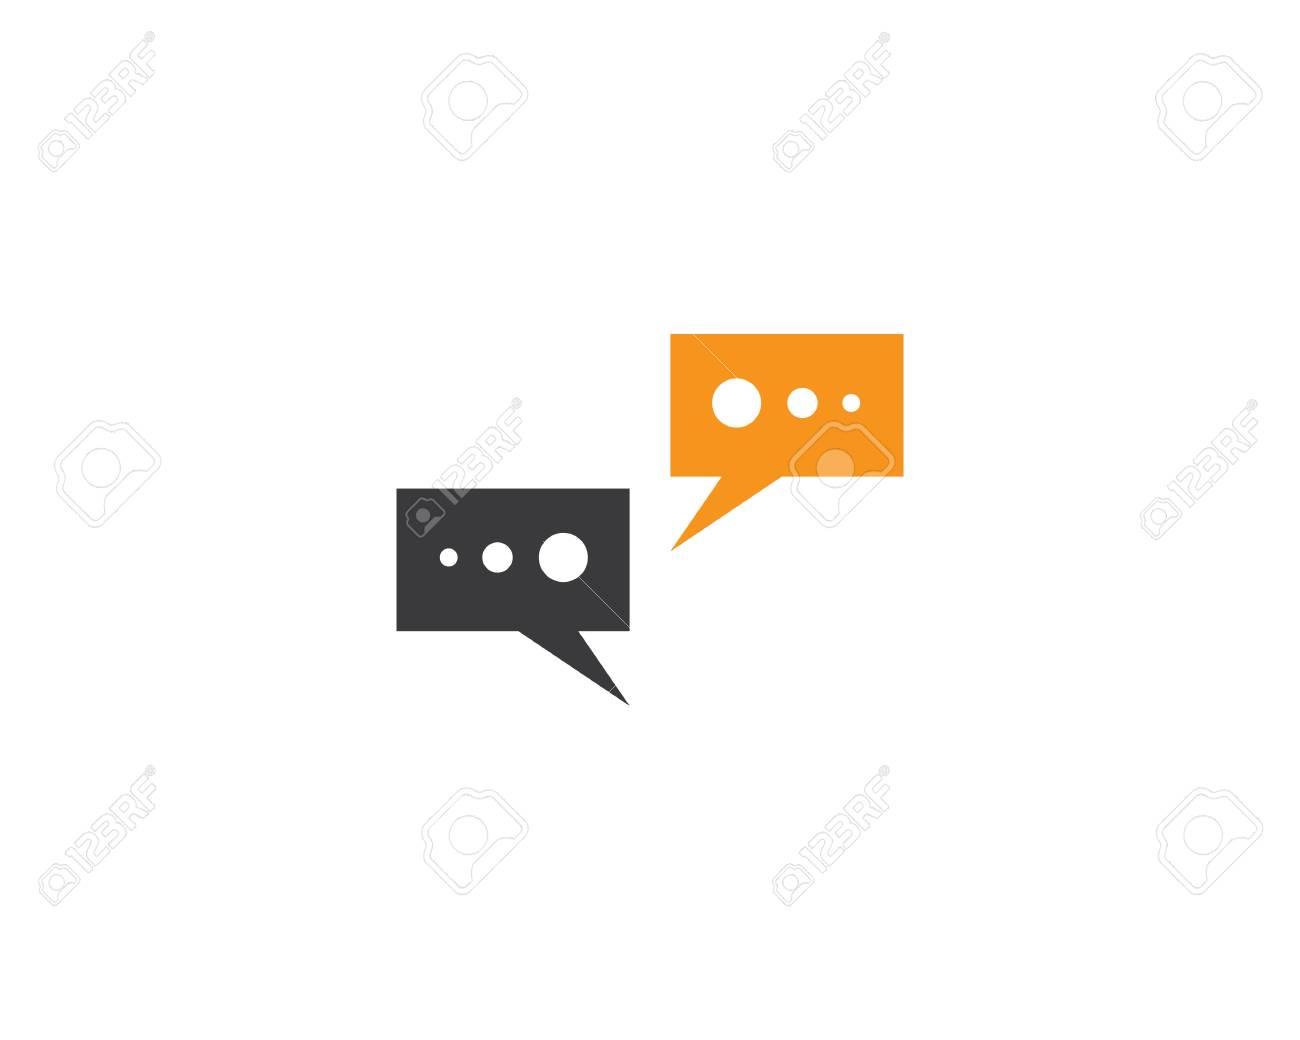 caf9191d08681f Speech bubble icon Logo template vector illustration Stock Vector -  113400593